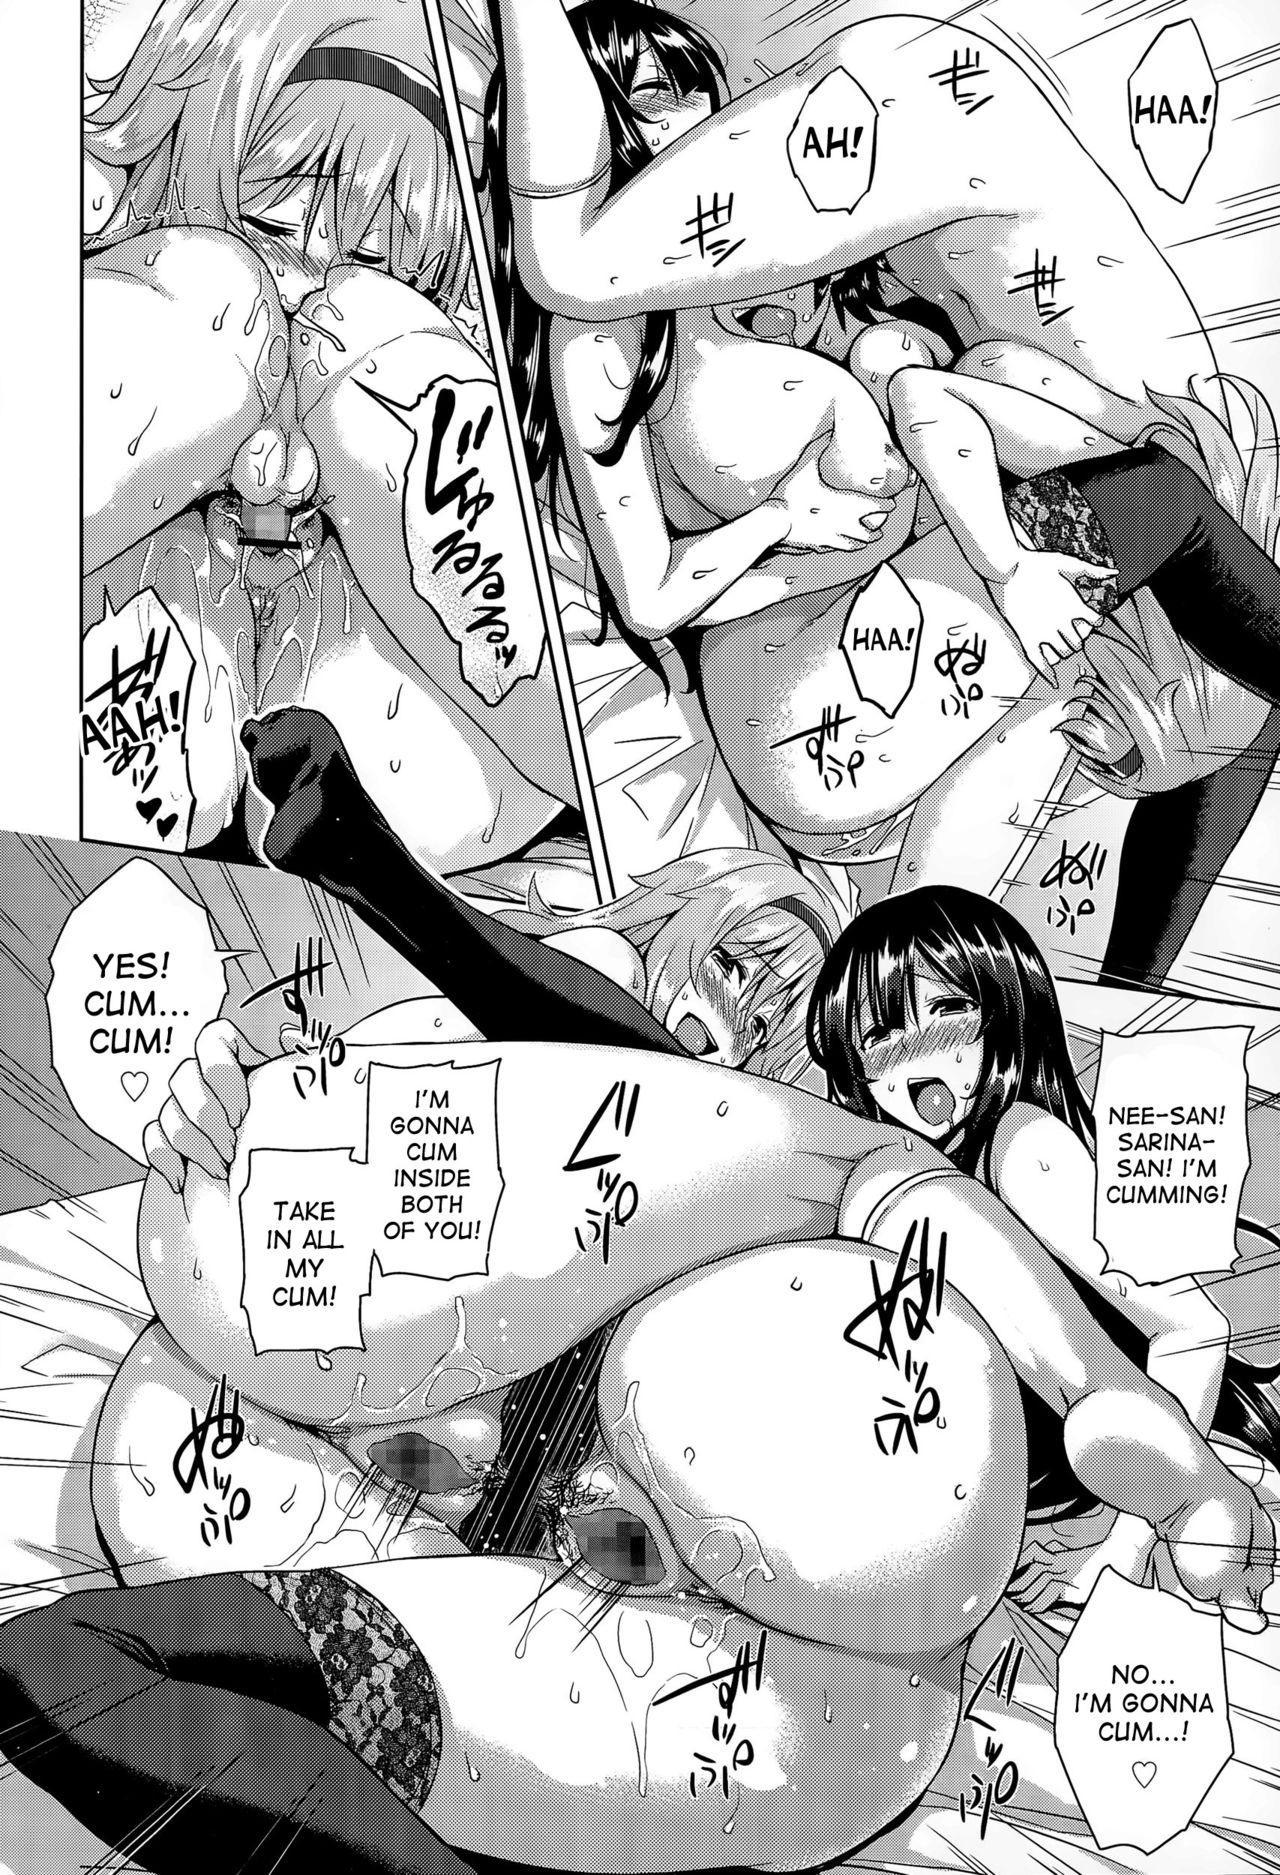 [Mikemono Yuu] Sokuhame! Onee-chans | Instant Sex! Onee-chans! (COMIC Koh Vol. 5) [English] [desudesu] 17